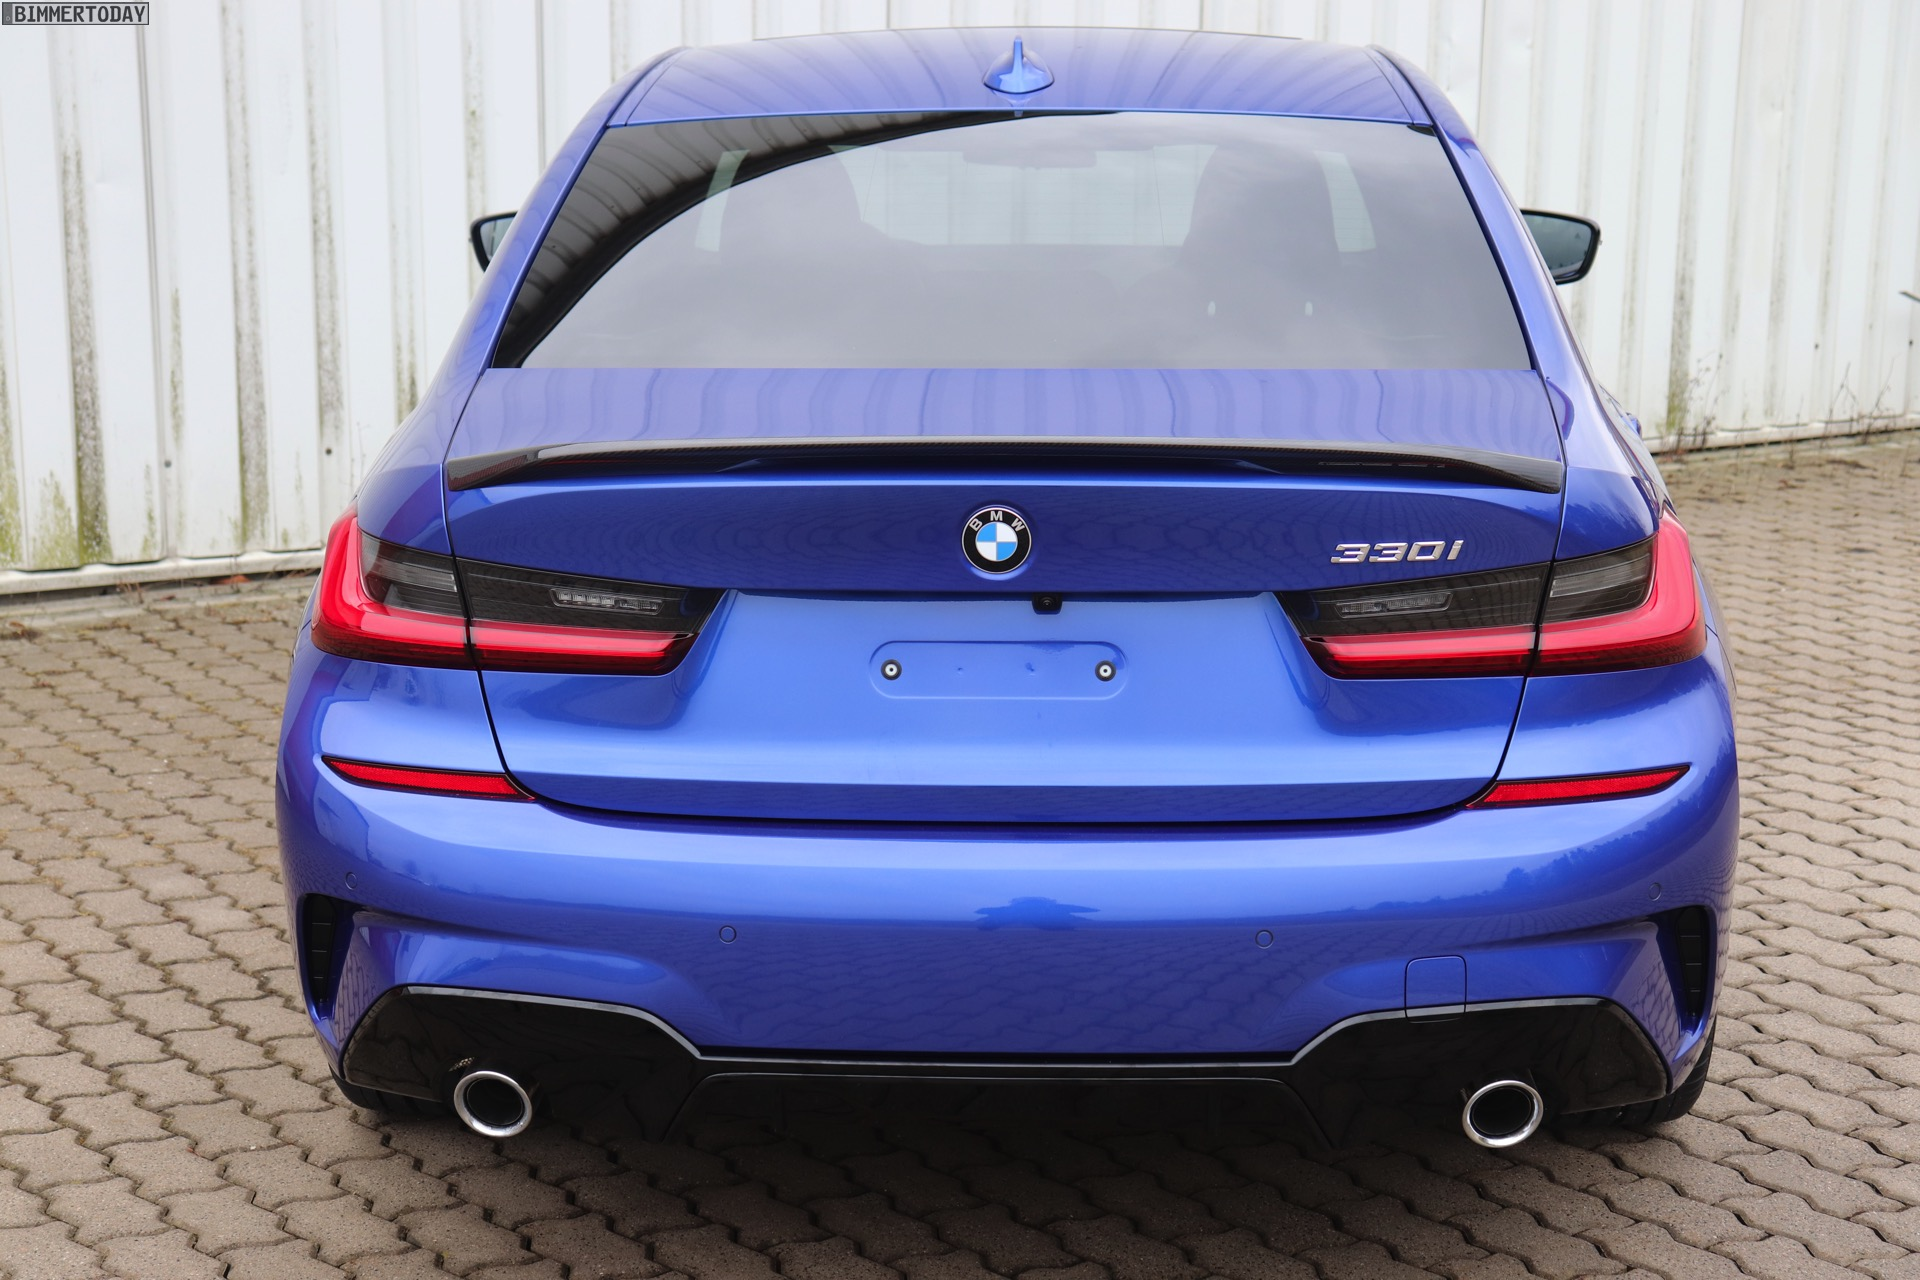 Name:  2019-BMW-330i-G20-M-Performance-Parts-1.jpg2019-BMW-330i-G20-M-Performance-Parts-1.jpg2019-BMW-3.jpg Views: 4173 Size:  455.8 KB